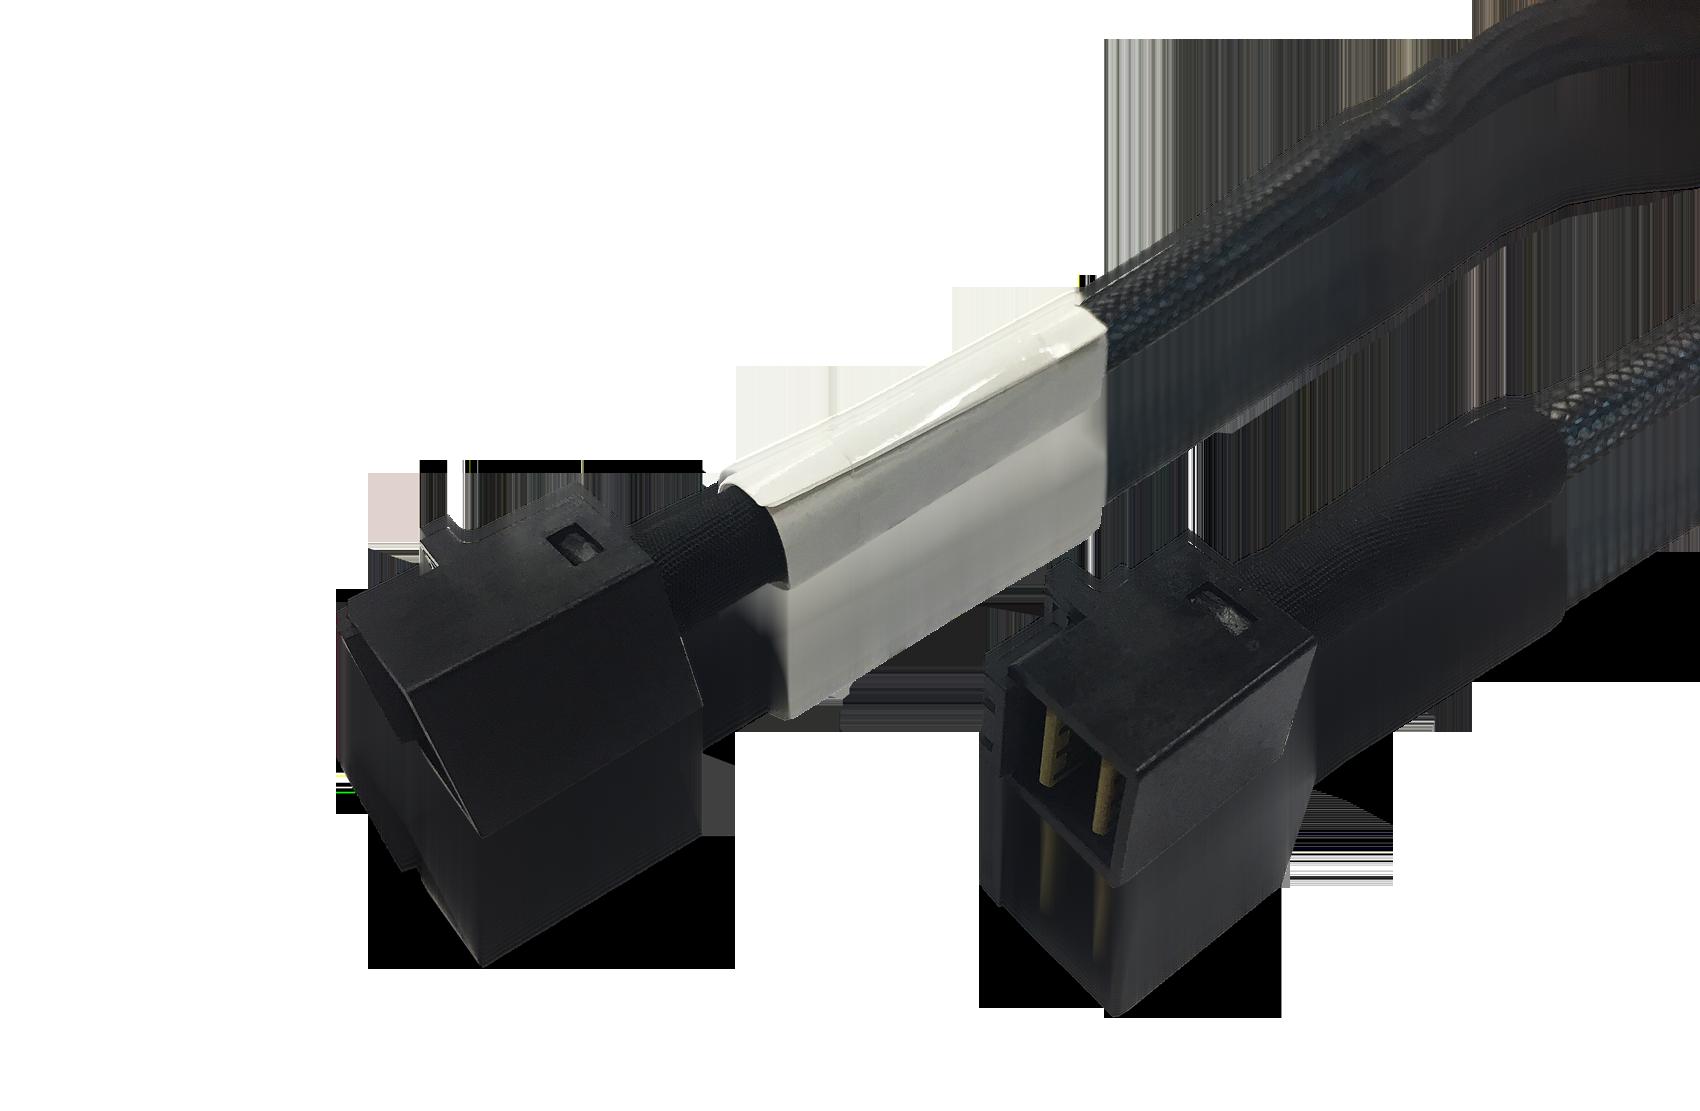 310101 Int. Mini SAS HD 4i Cable - 12G